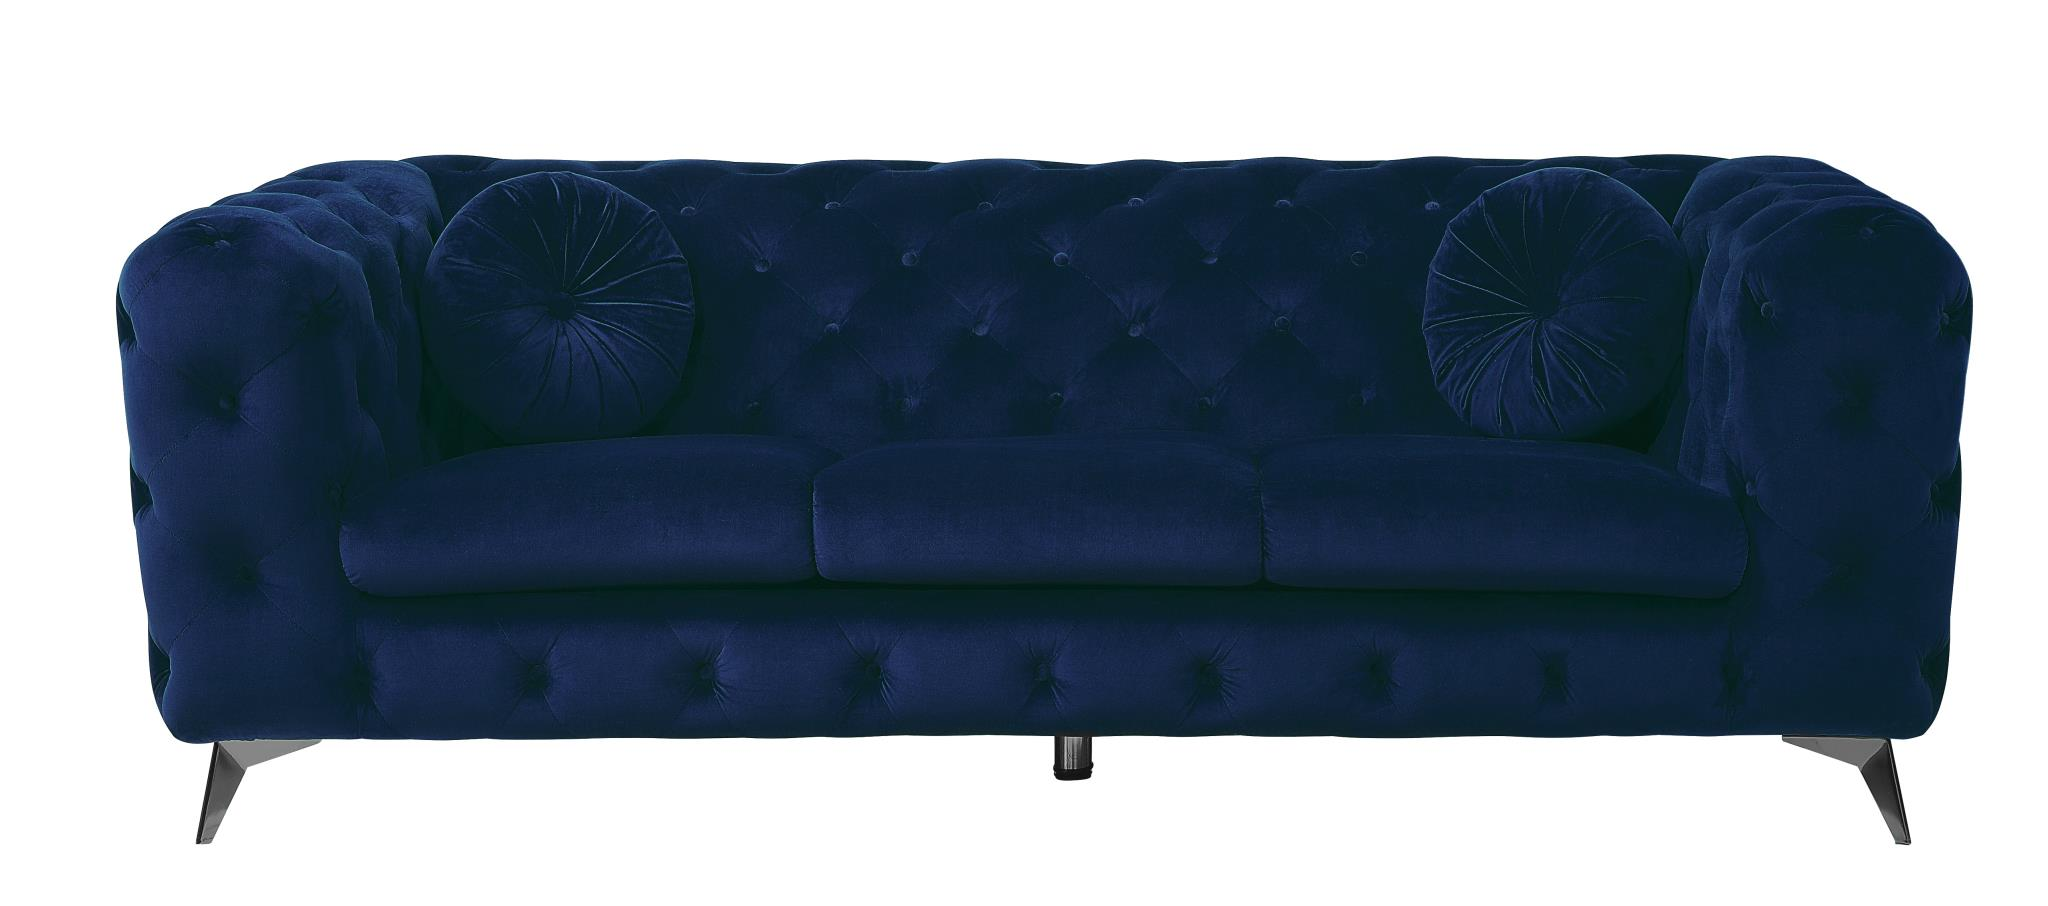 Blue Sofa Front